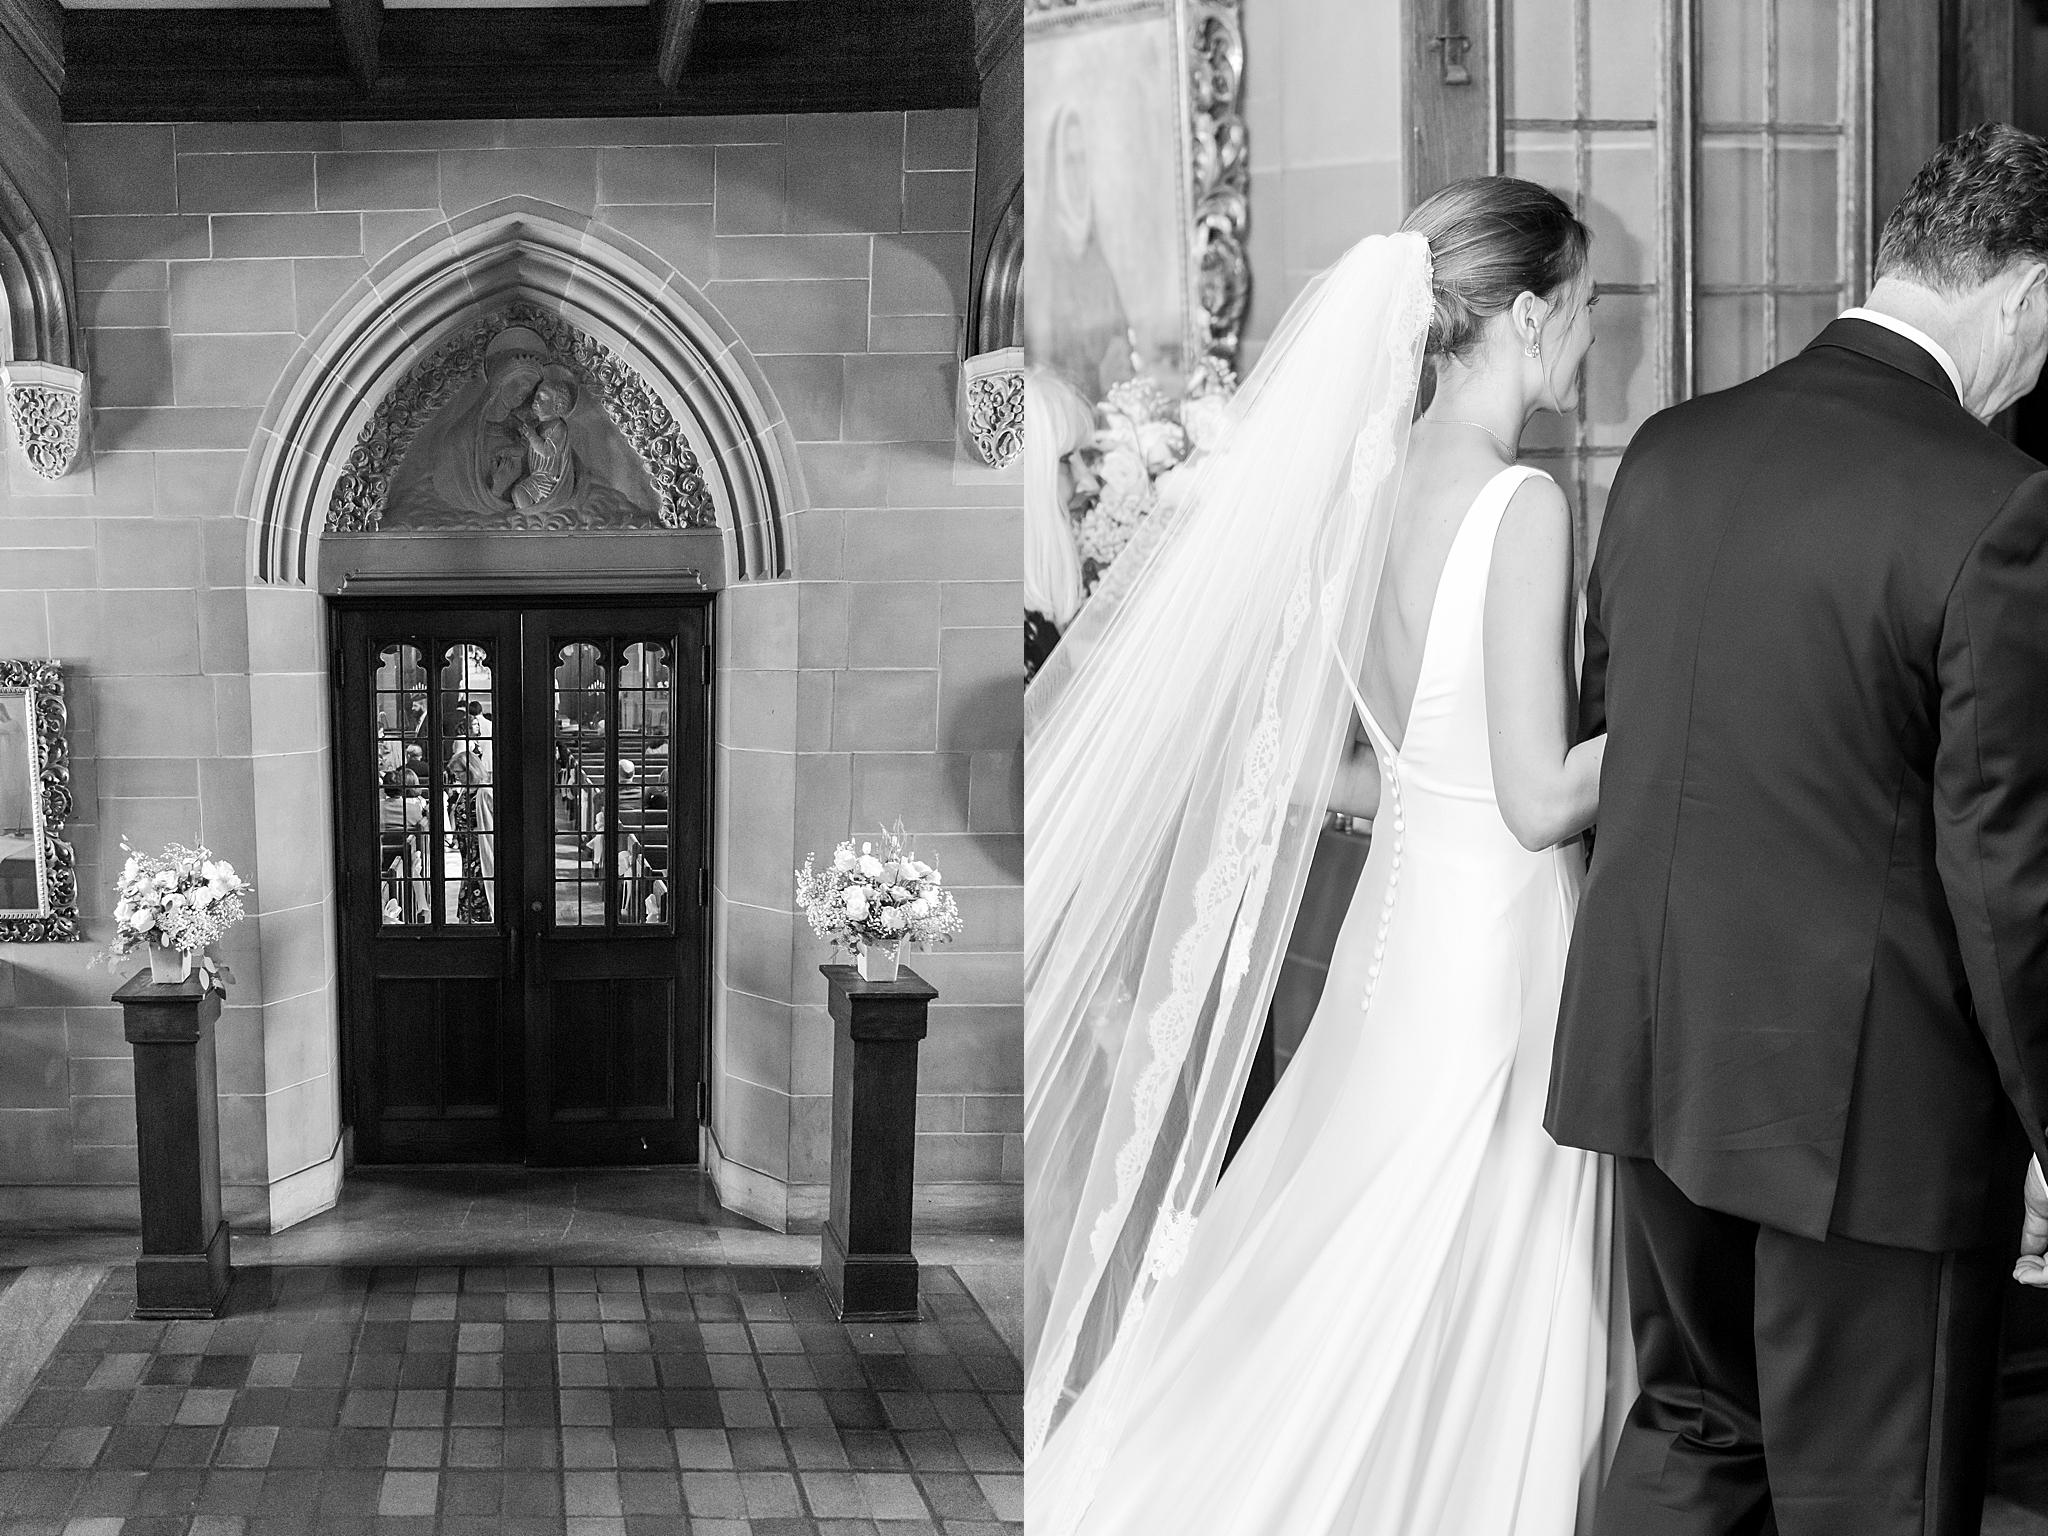 detroit-wedding-photographer-grosse-pointe-academy-chapel-detroit-golf-club-wedding-carly-matt-by-courtney-carolyn-photography_0030.jpg